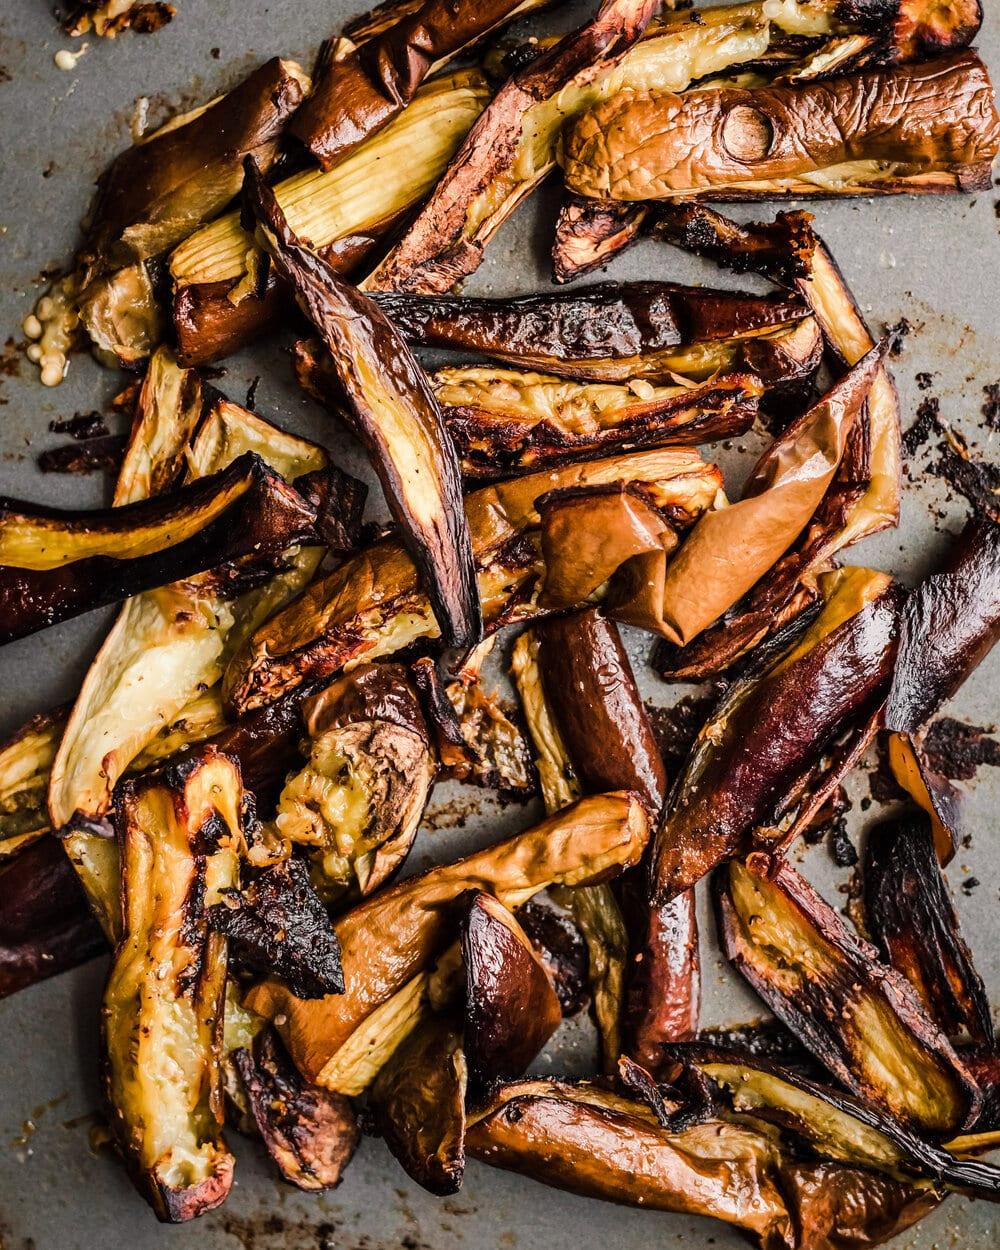 roasted eggplant on a baking sheet. eggplant food photography.